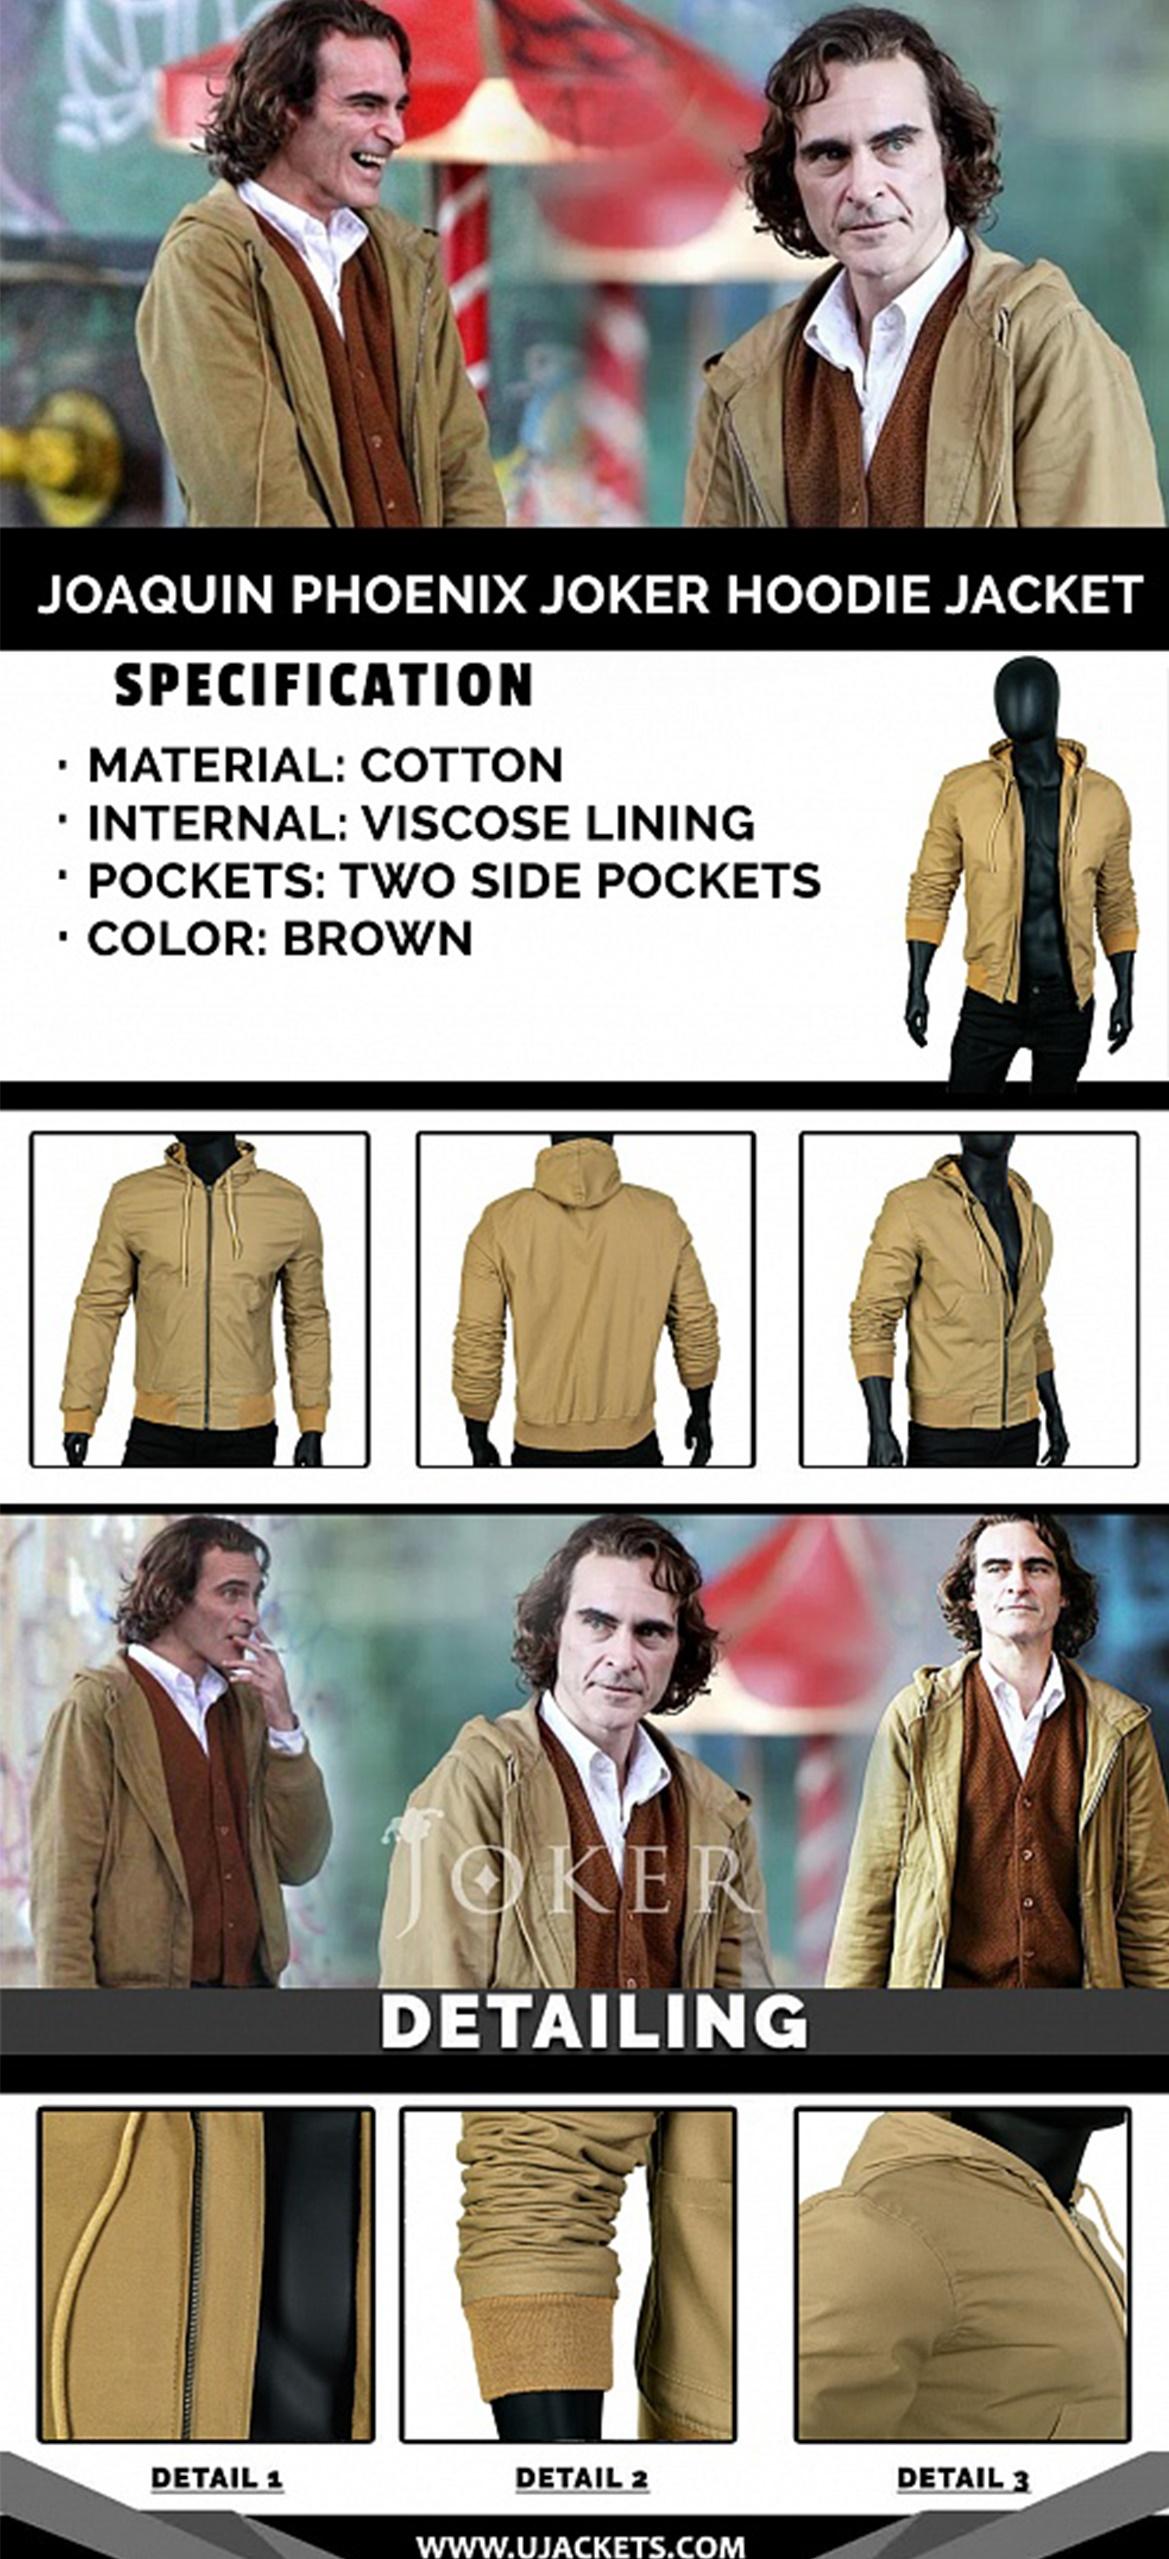 Joaquin Phoenix Joker Hoddie Jacket